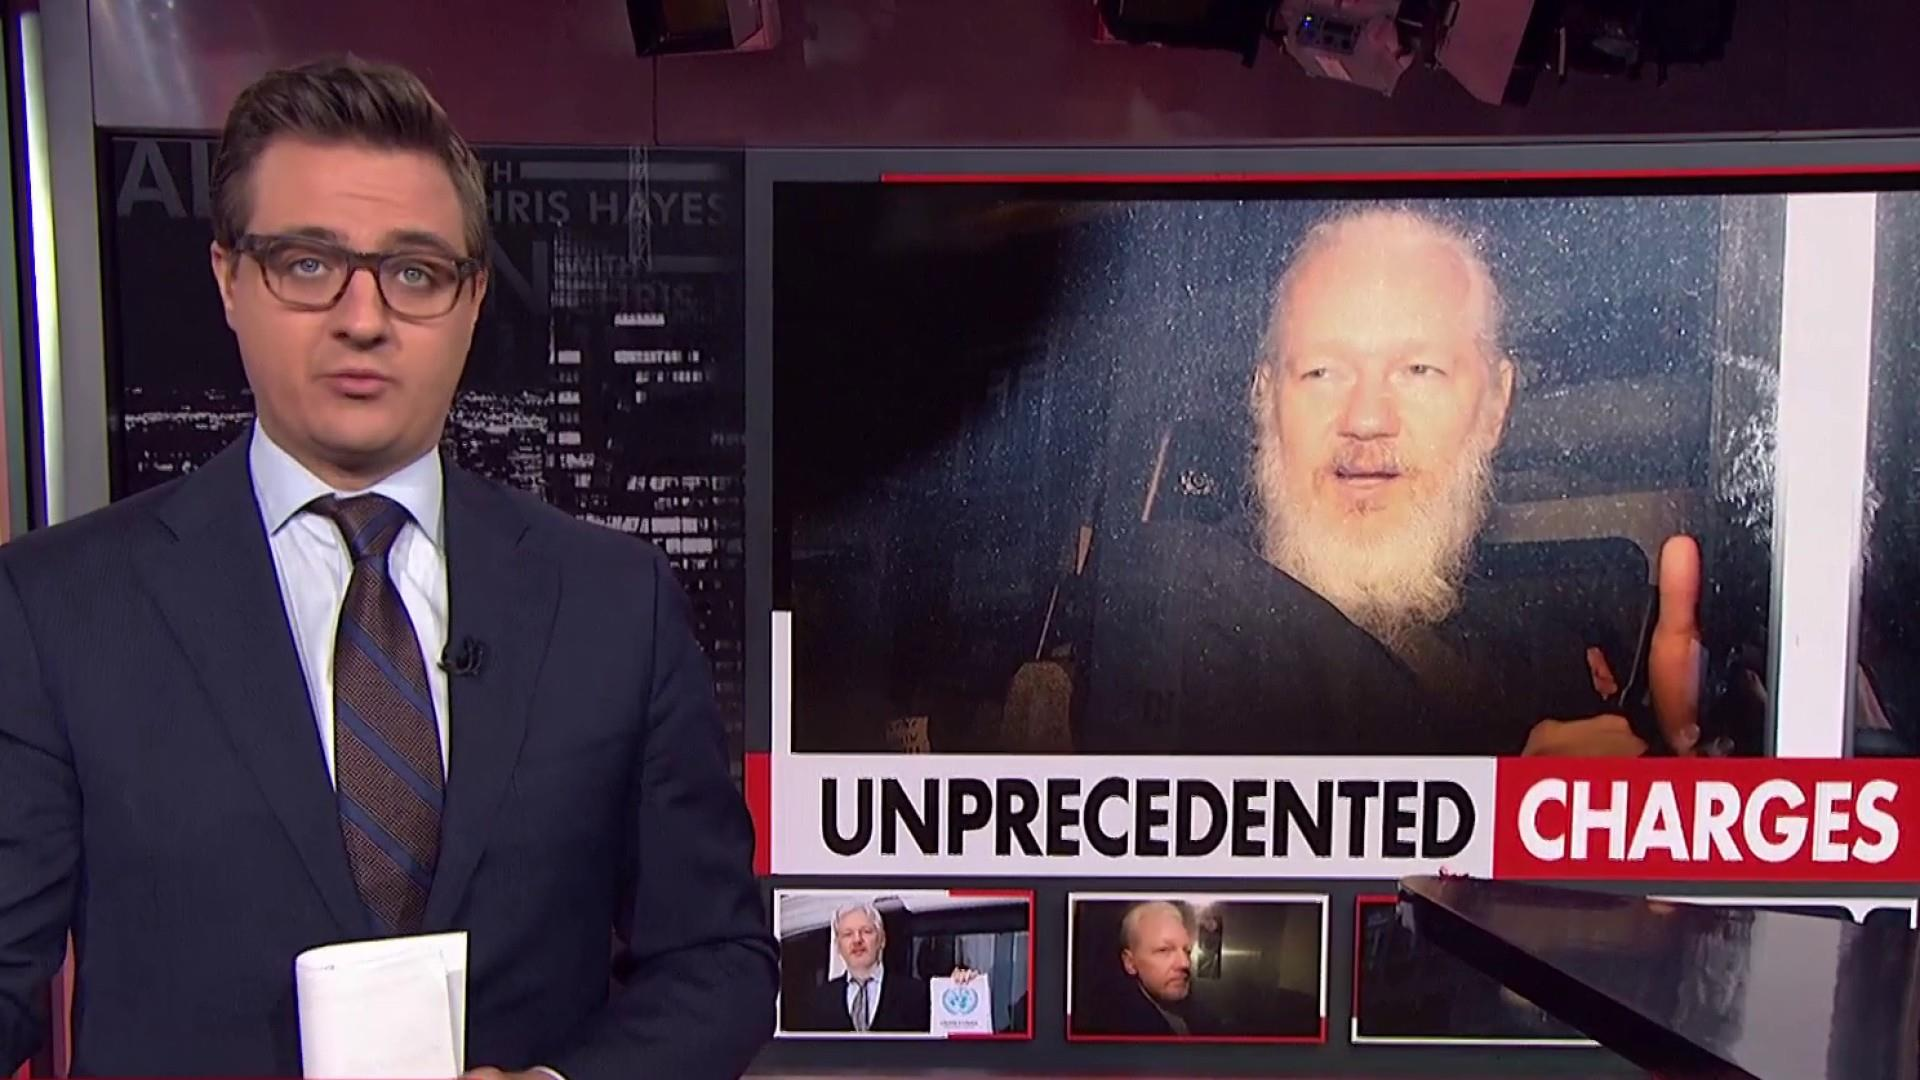 Unprecedented charges against Assange